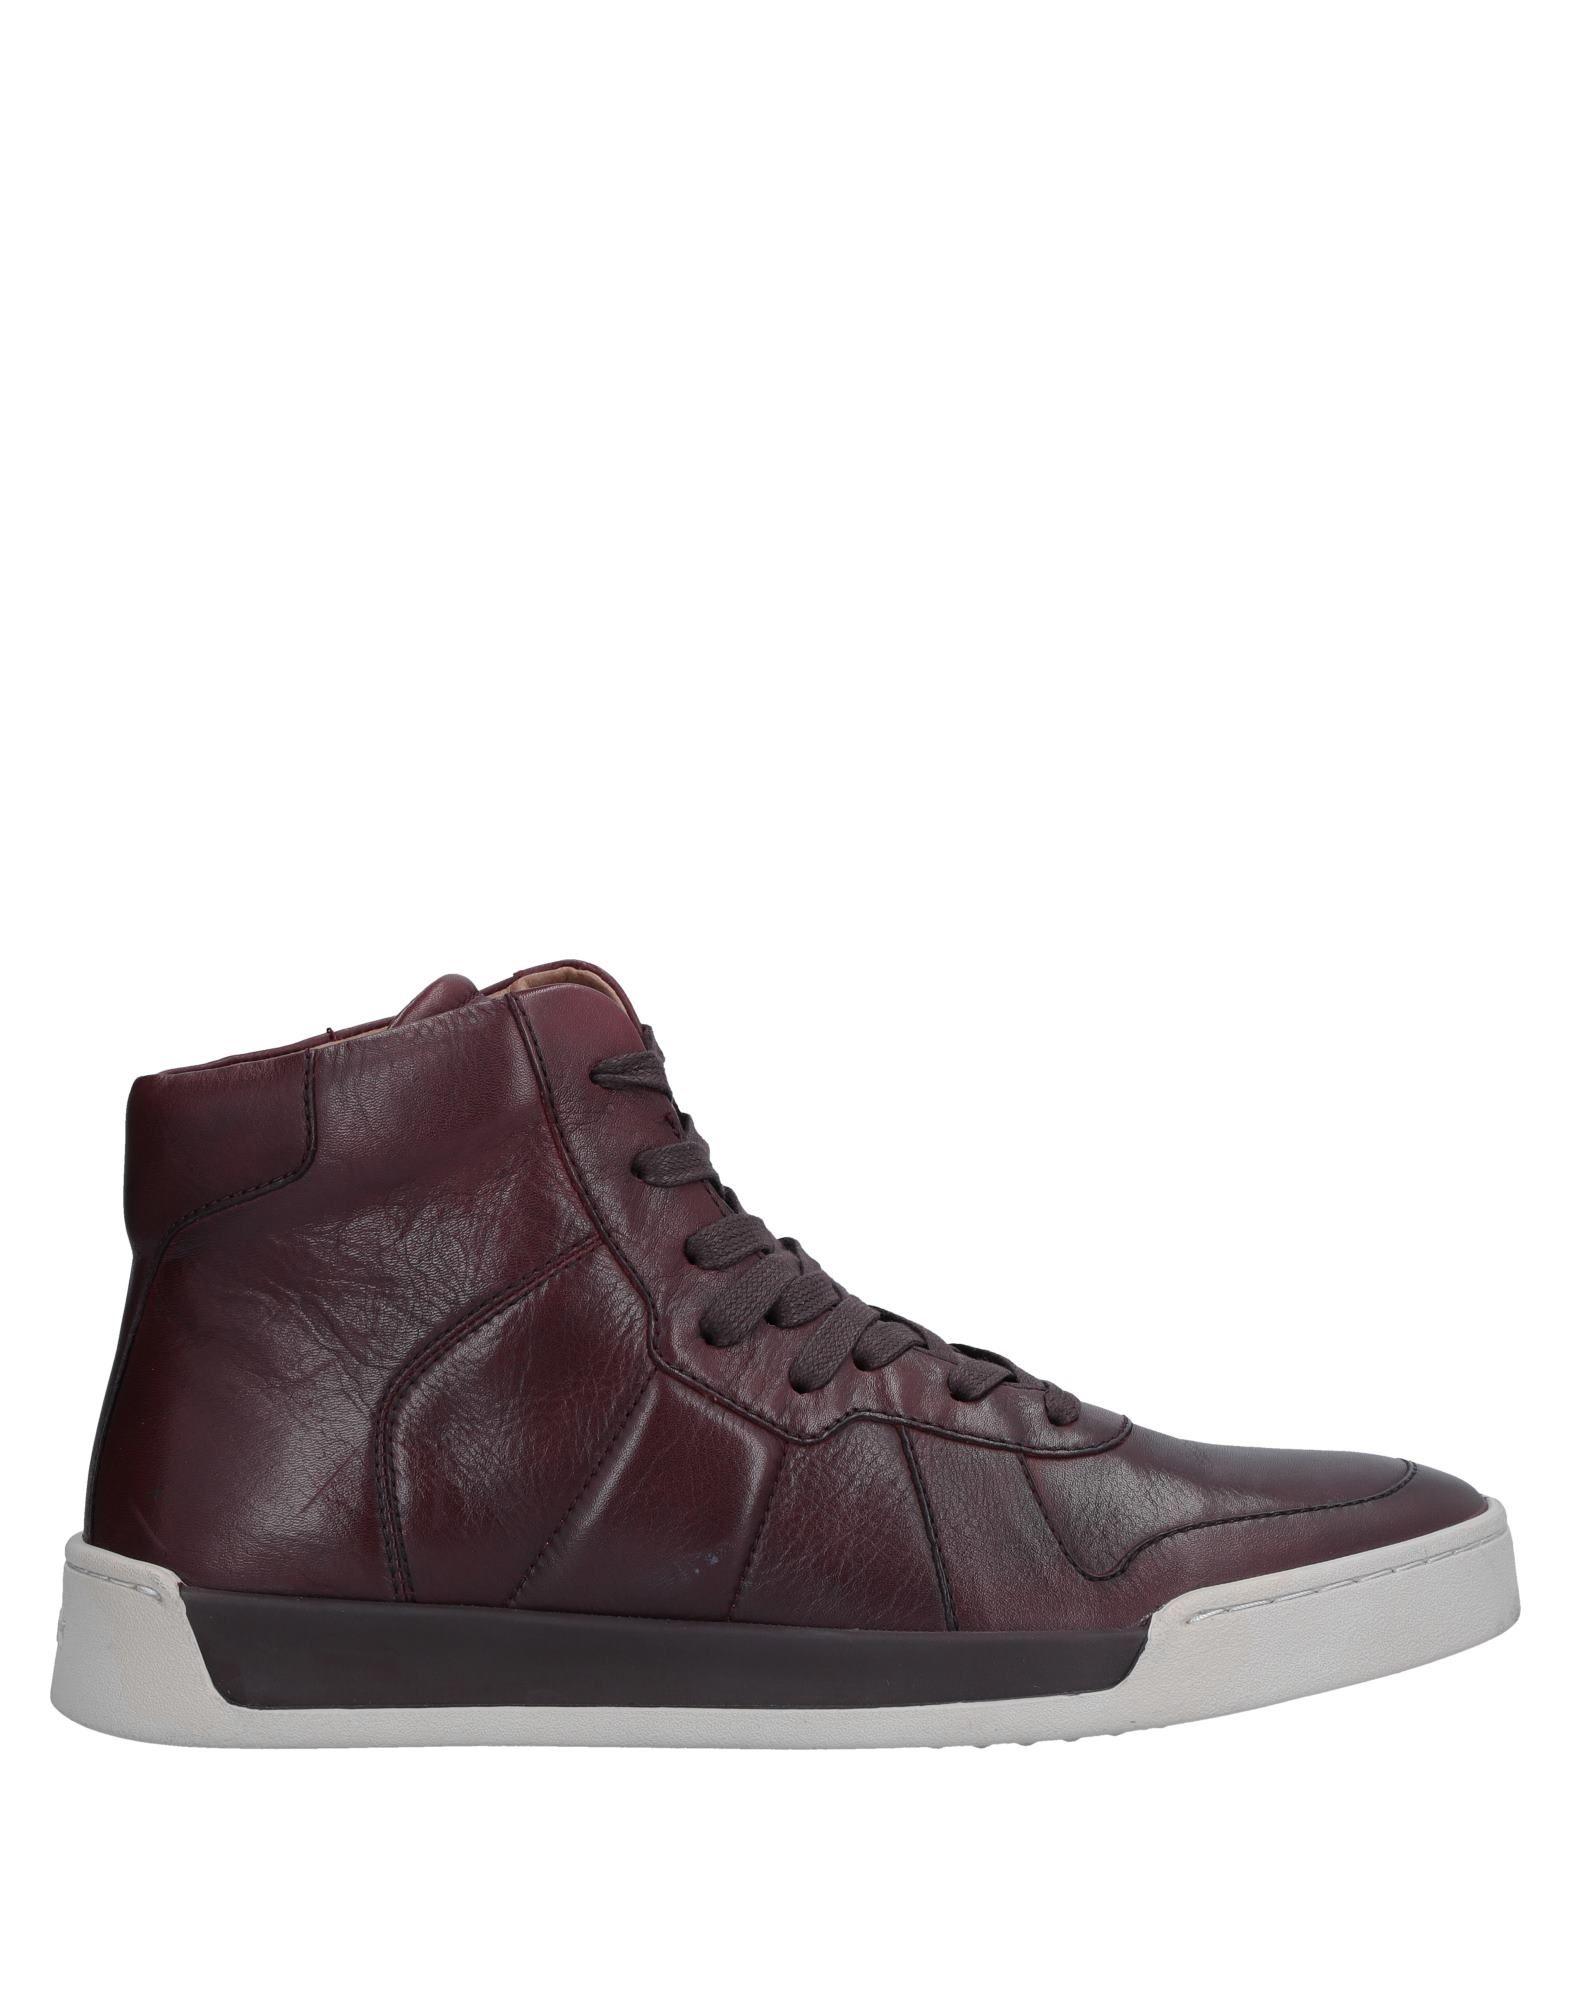 John Varvatos ★ U.S.A. Sneakers Herren  11535897OH Gute Qualität beliebte Schuhe